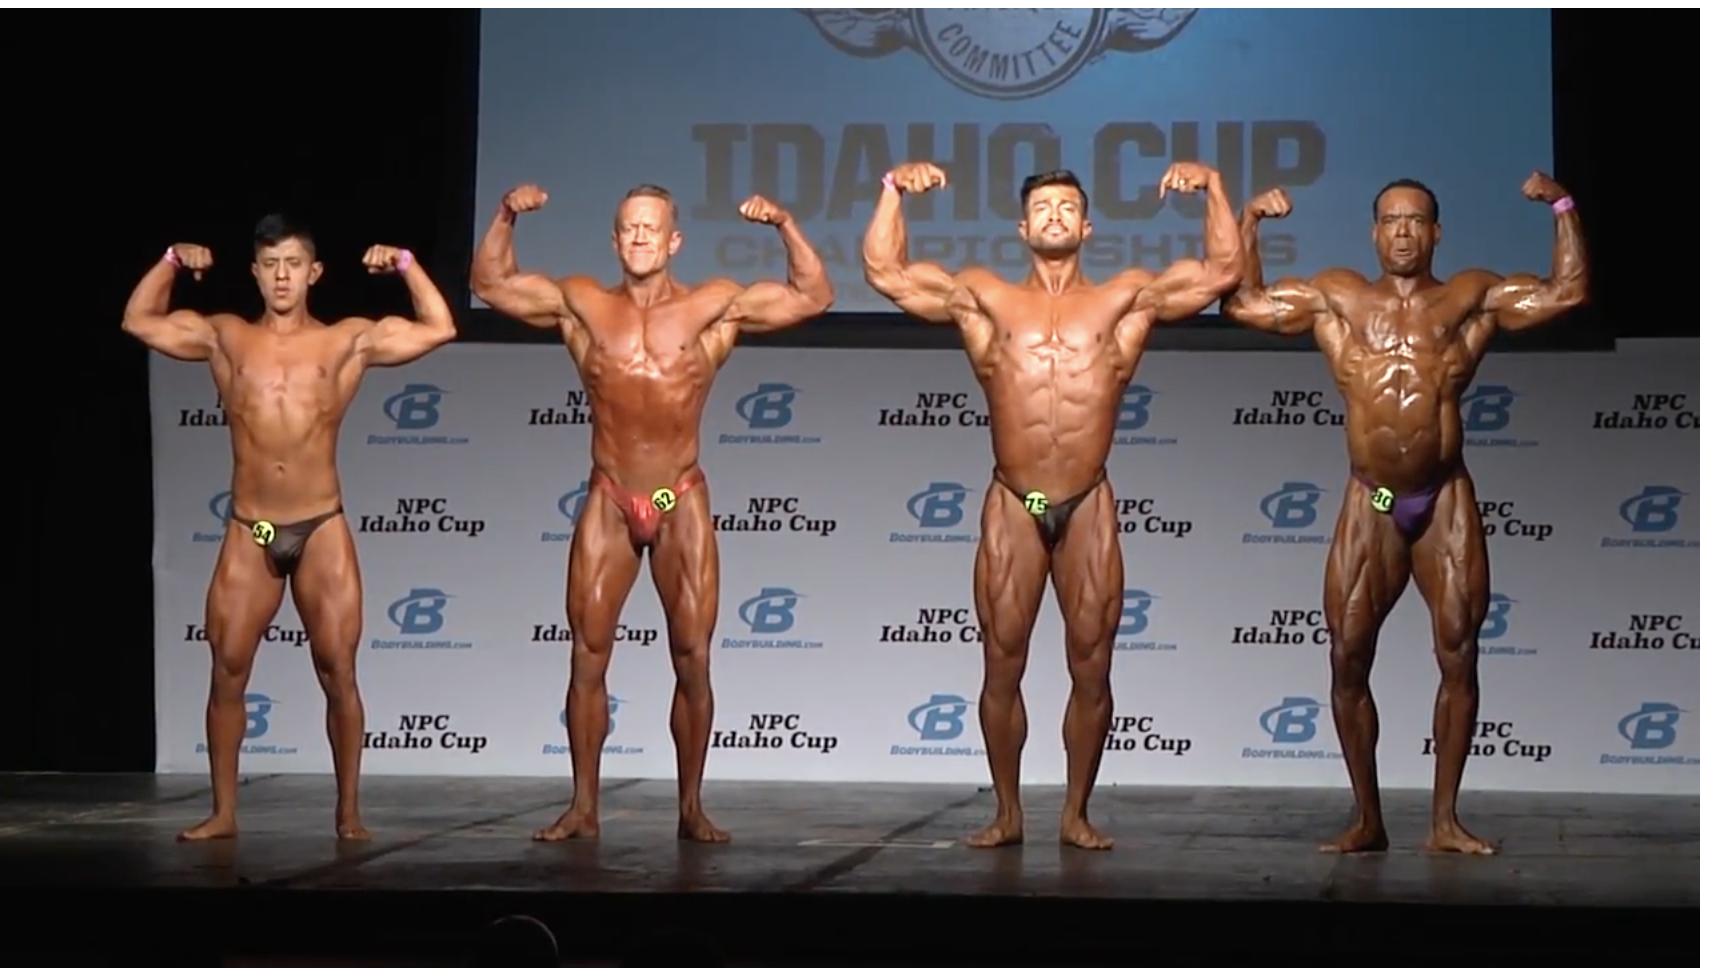 2017 NPC Idaho Cup Men's Bodybuilding Overall Video